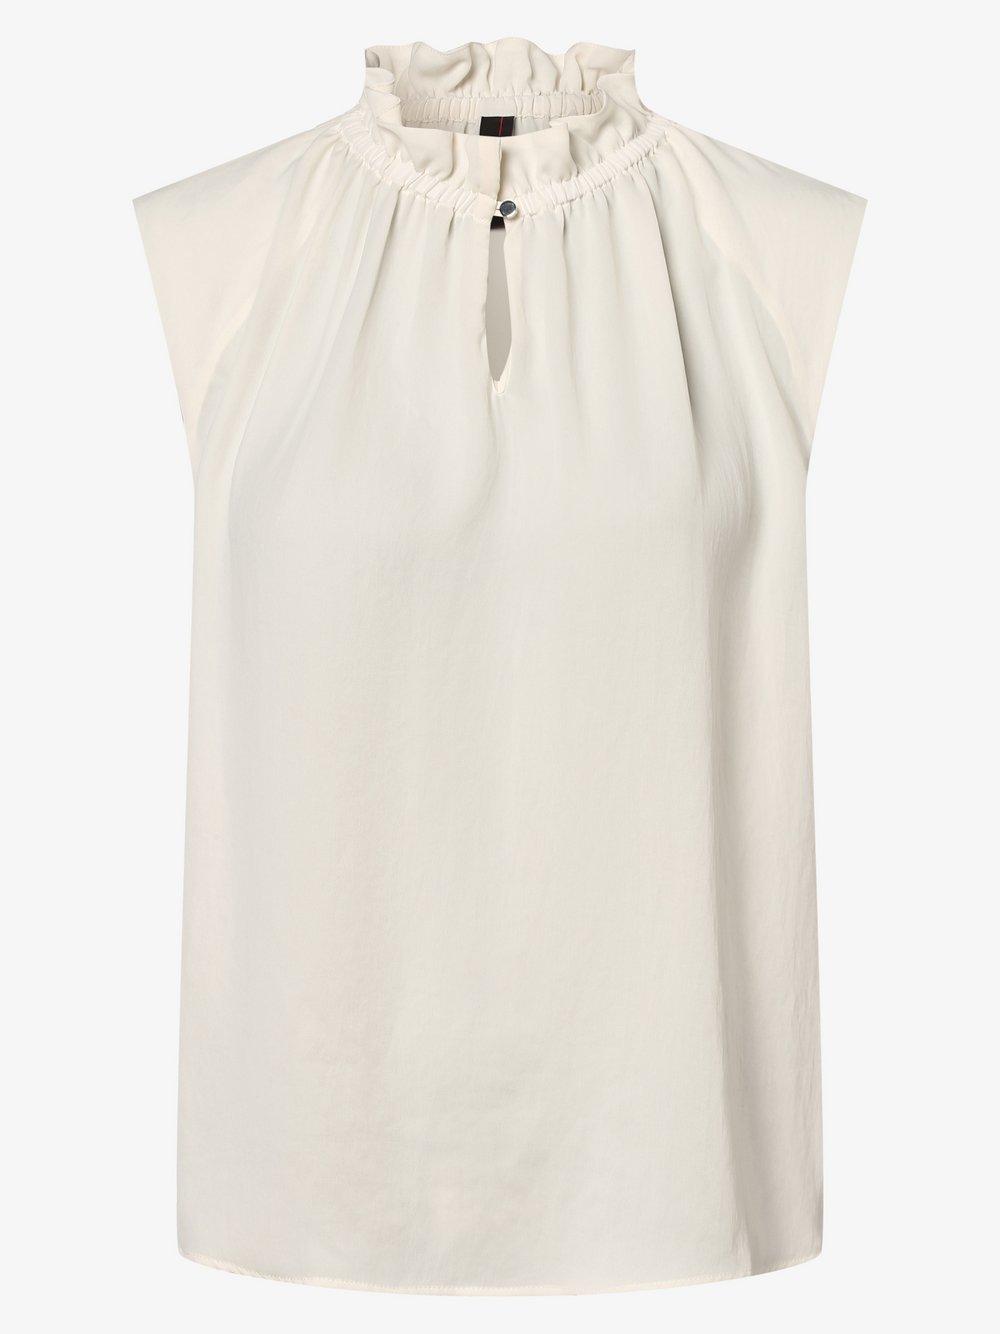 Marc Cain Collections – Damska bluzka bez rękawów, biały Van Graaf 458991-0001-00440